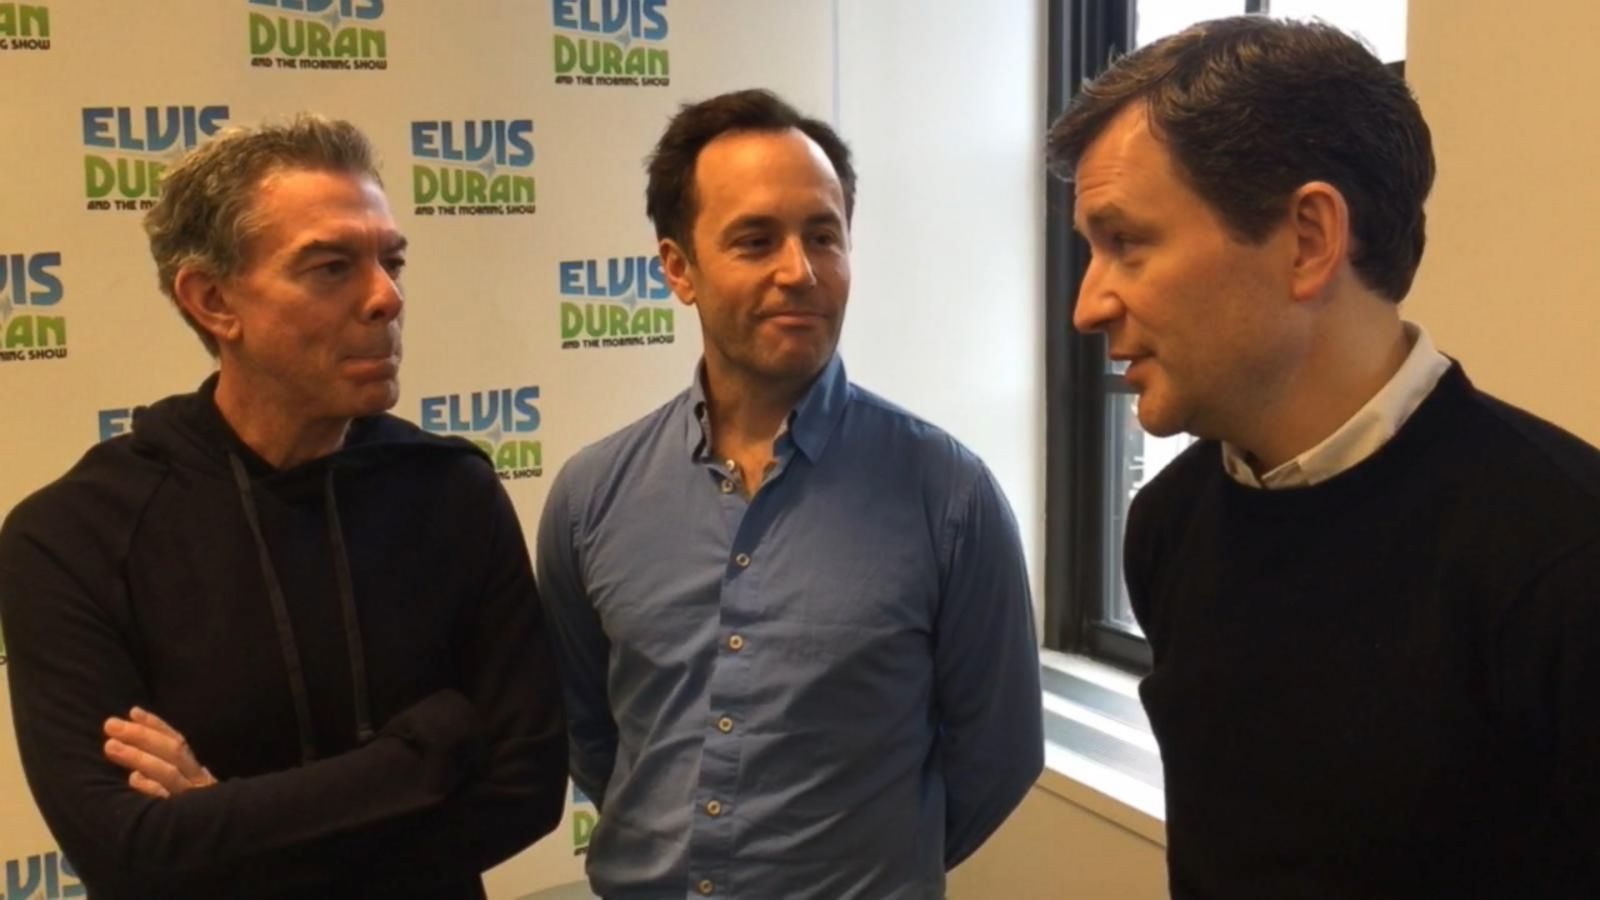 10% Happier Road Trip: Morning Radio Show Host Elvis Duran